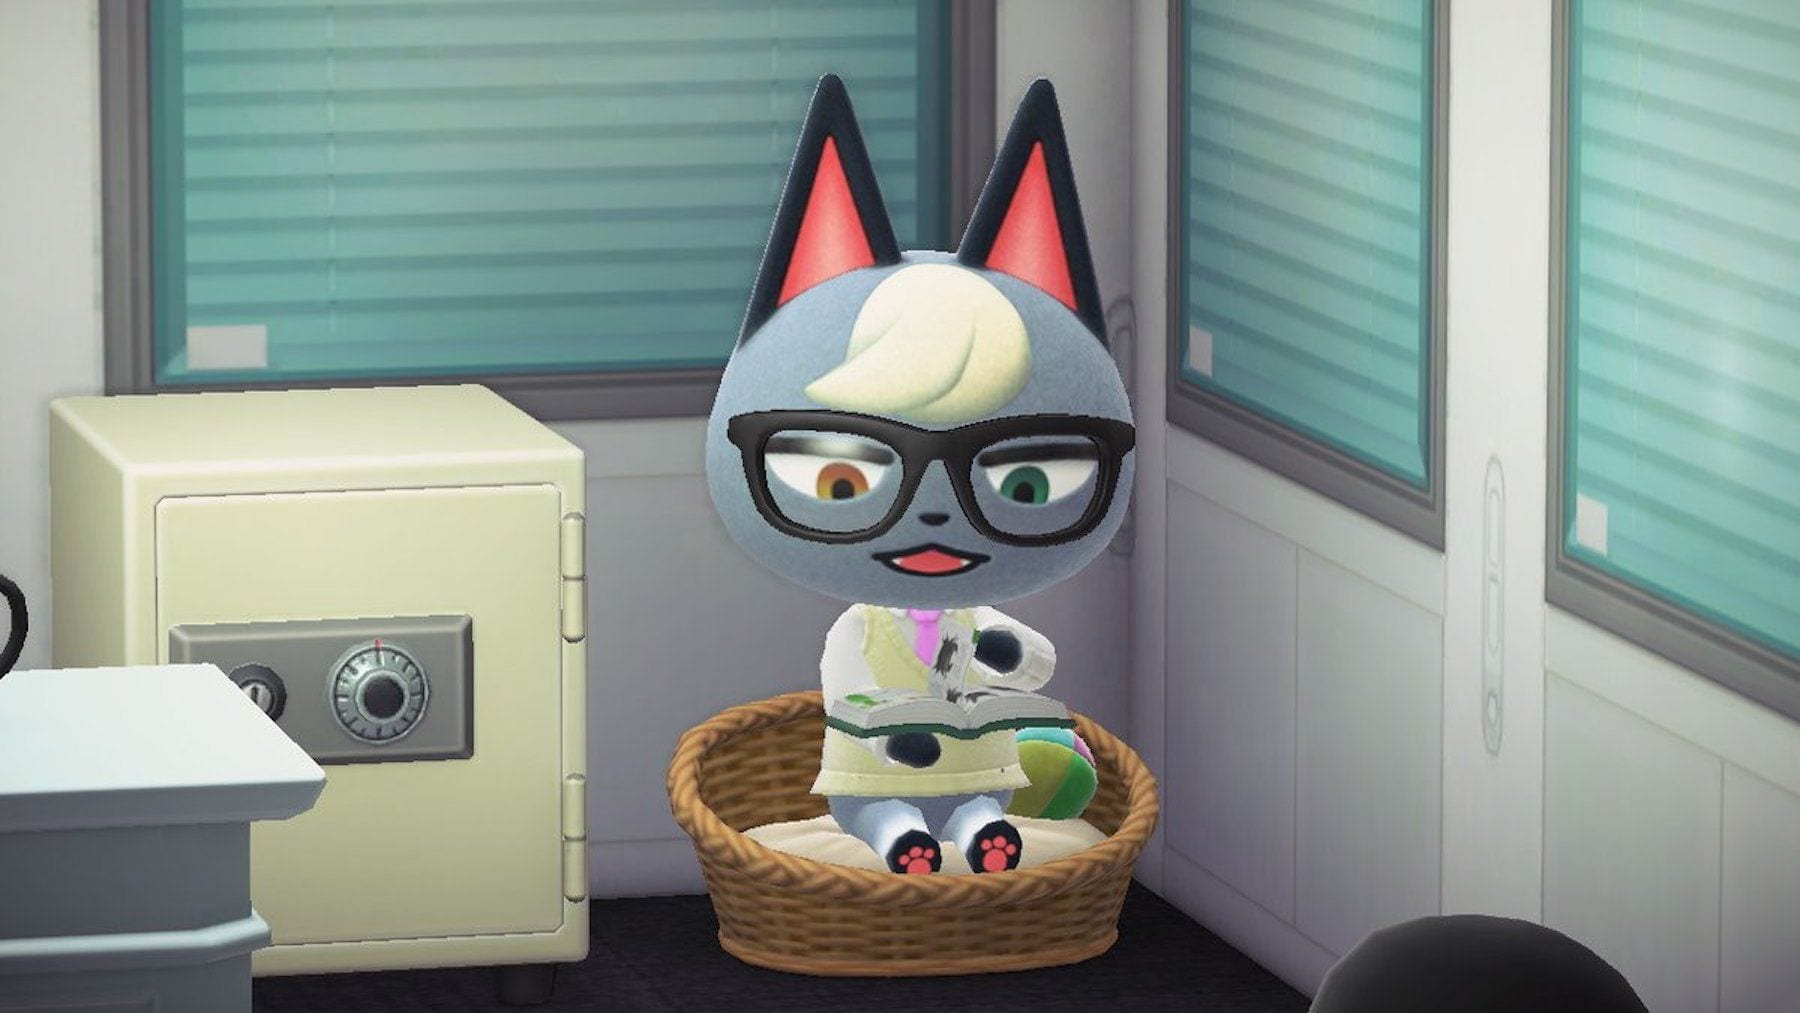 Gunnar (Raymond) als beliebtester Bewohner in in Animal Crossing New Horizons